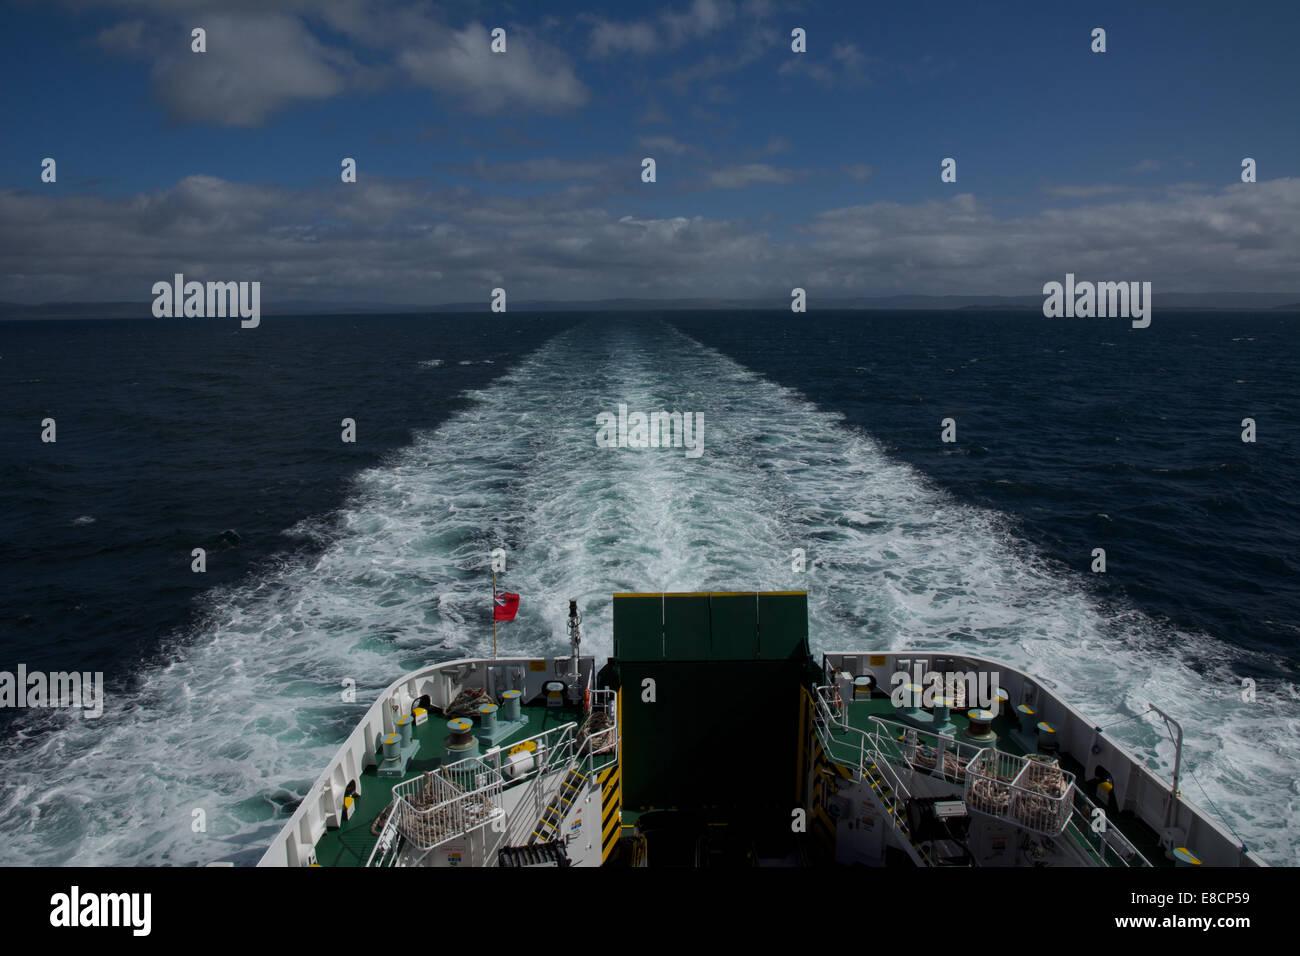 Caledonian Macbride (CalMac) car ferry Finlaggan en route from Kennacraig to Islay Port Askaig Stock Photo